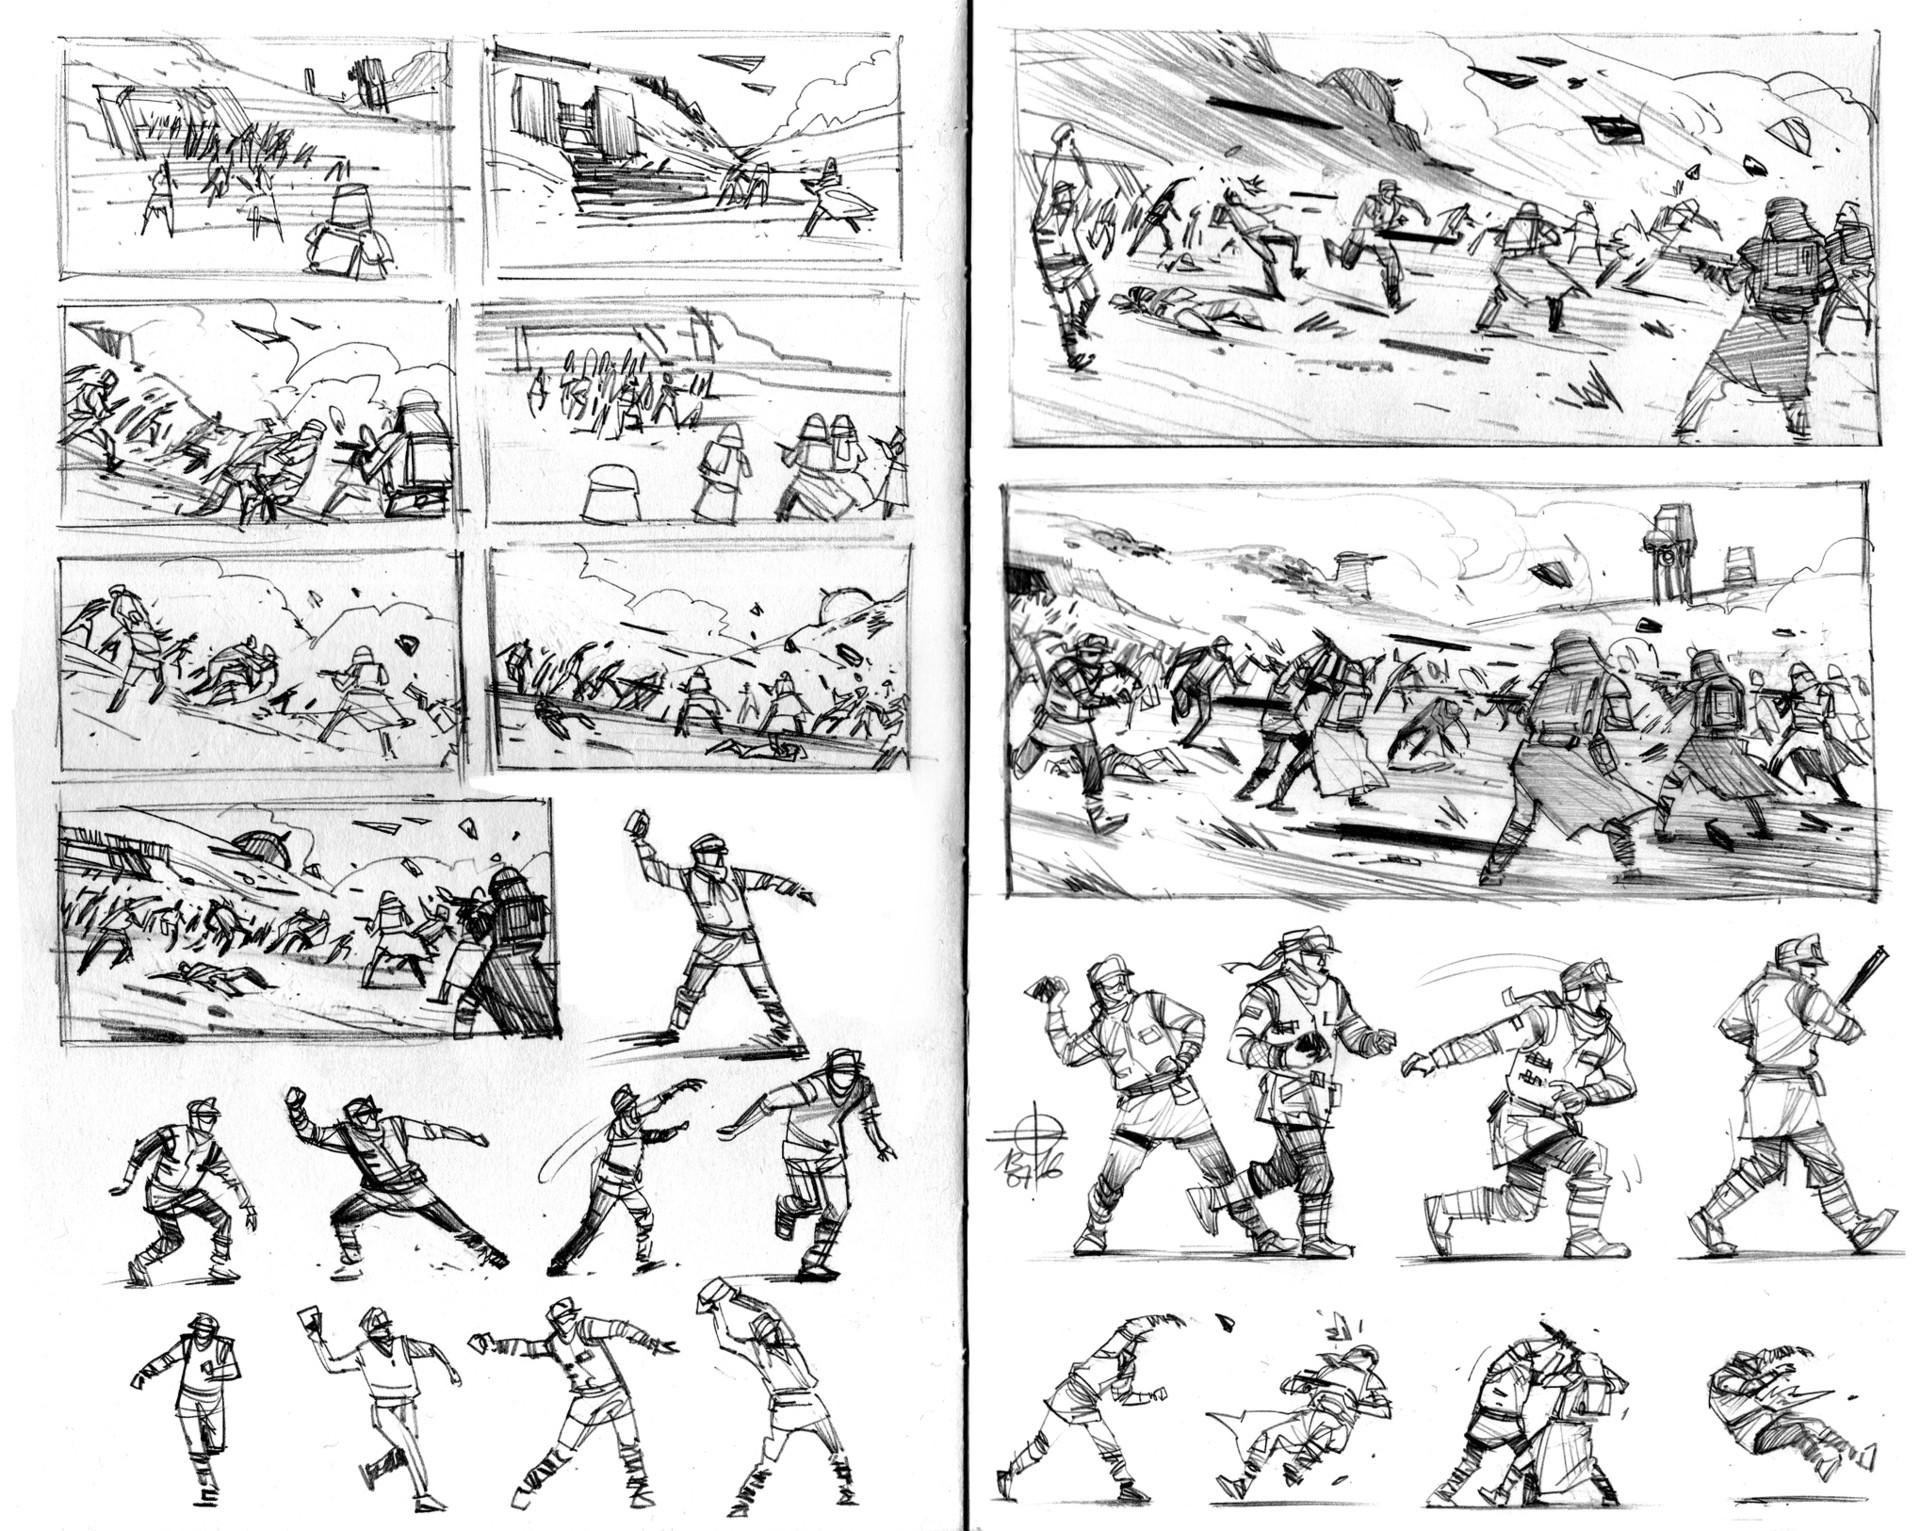 Renaud roche part01 sketches03b